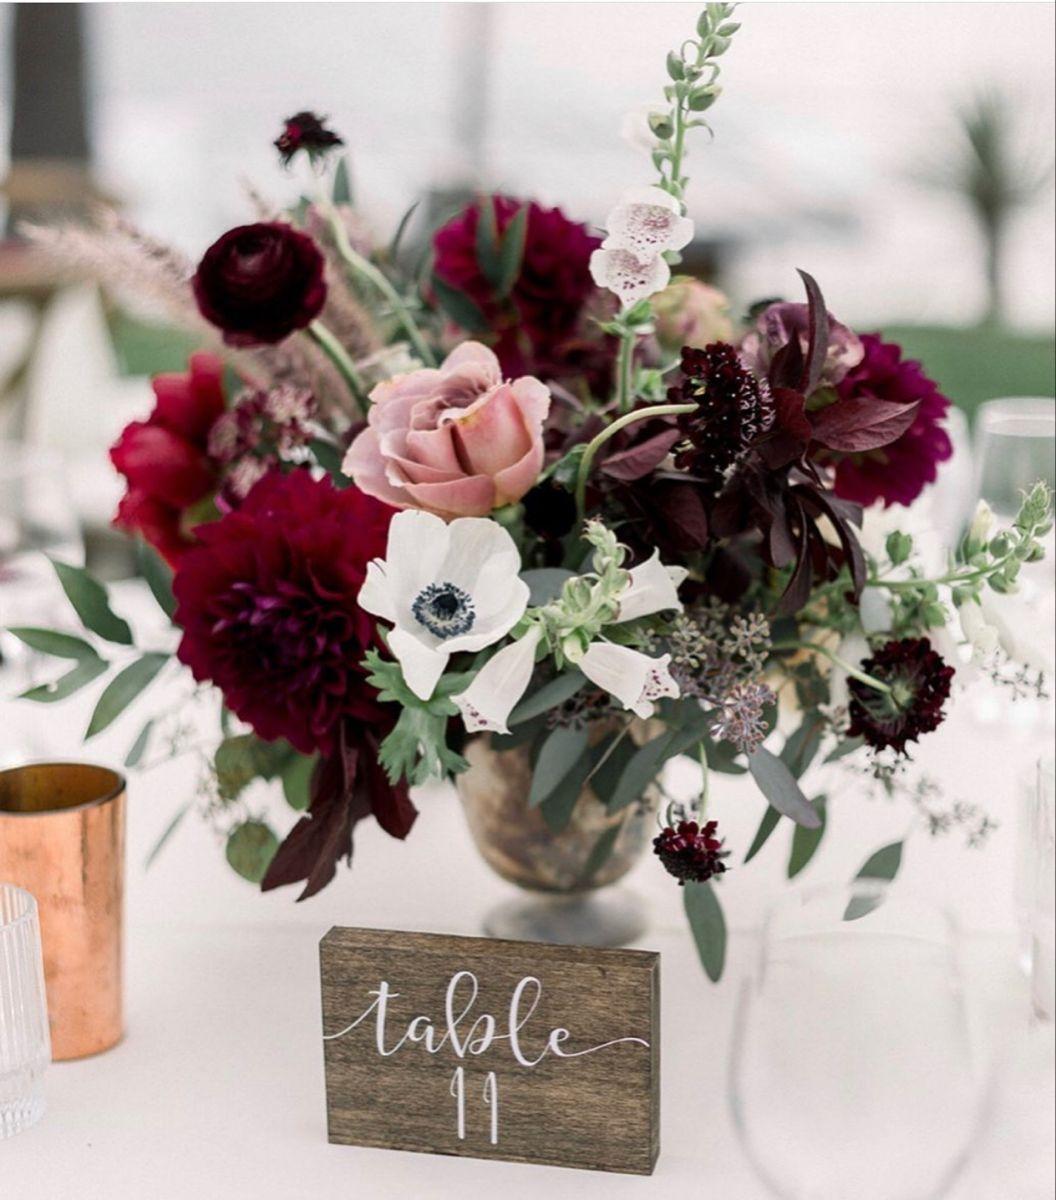 Burgundy Flowers In 2020 Burgundy Flowers Burgundy Wedding Flowers Purple Wedding Flowers